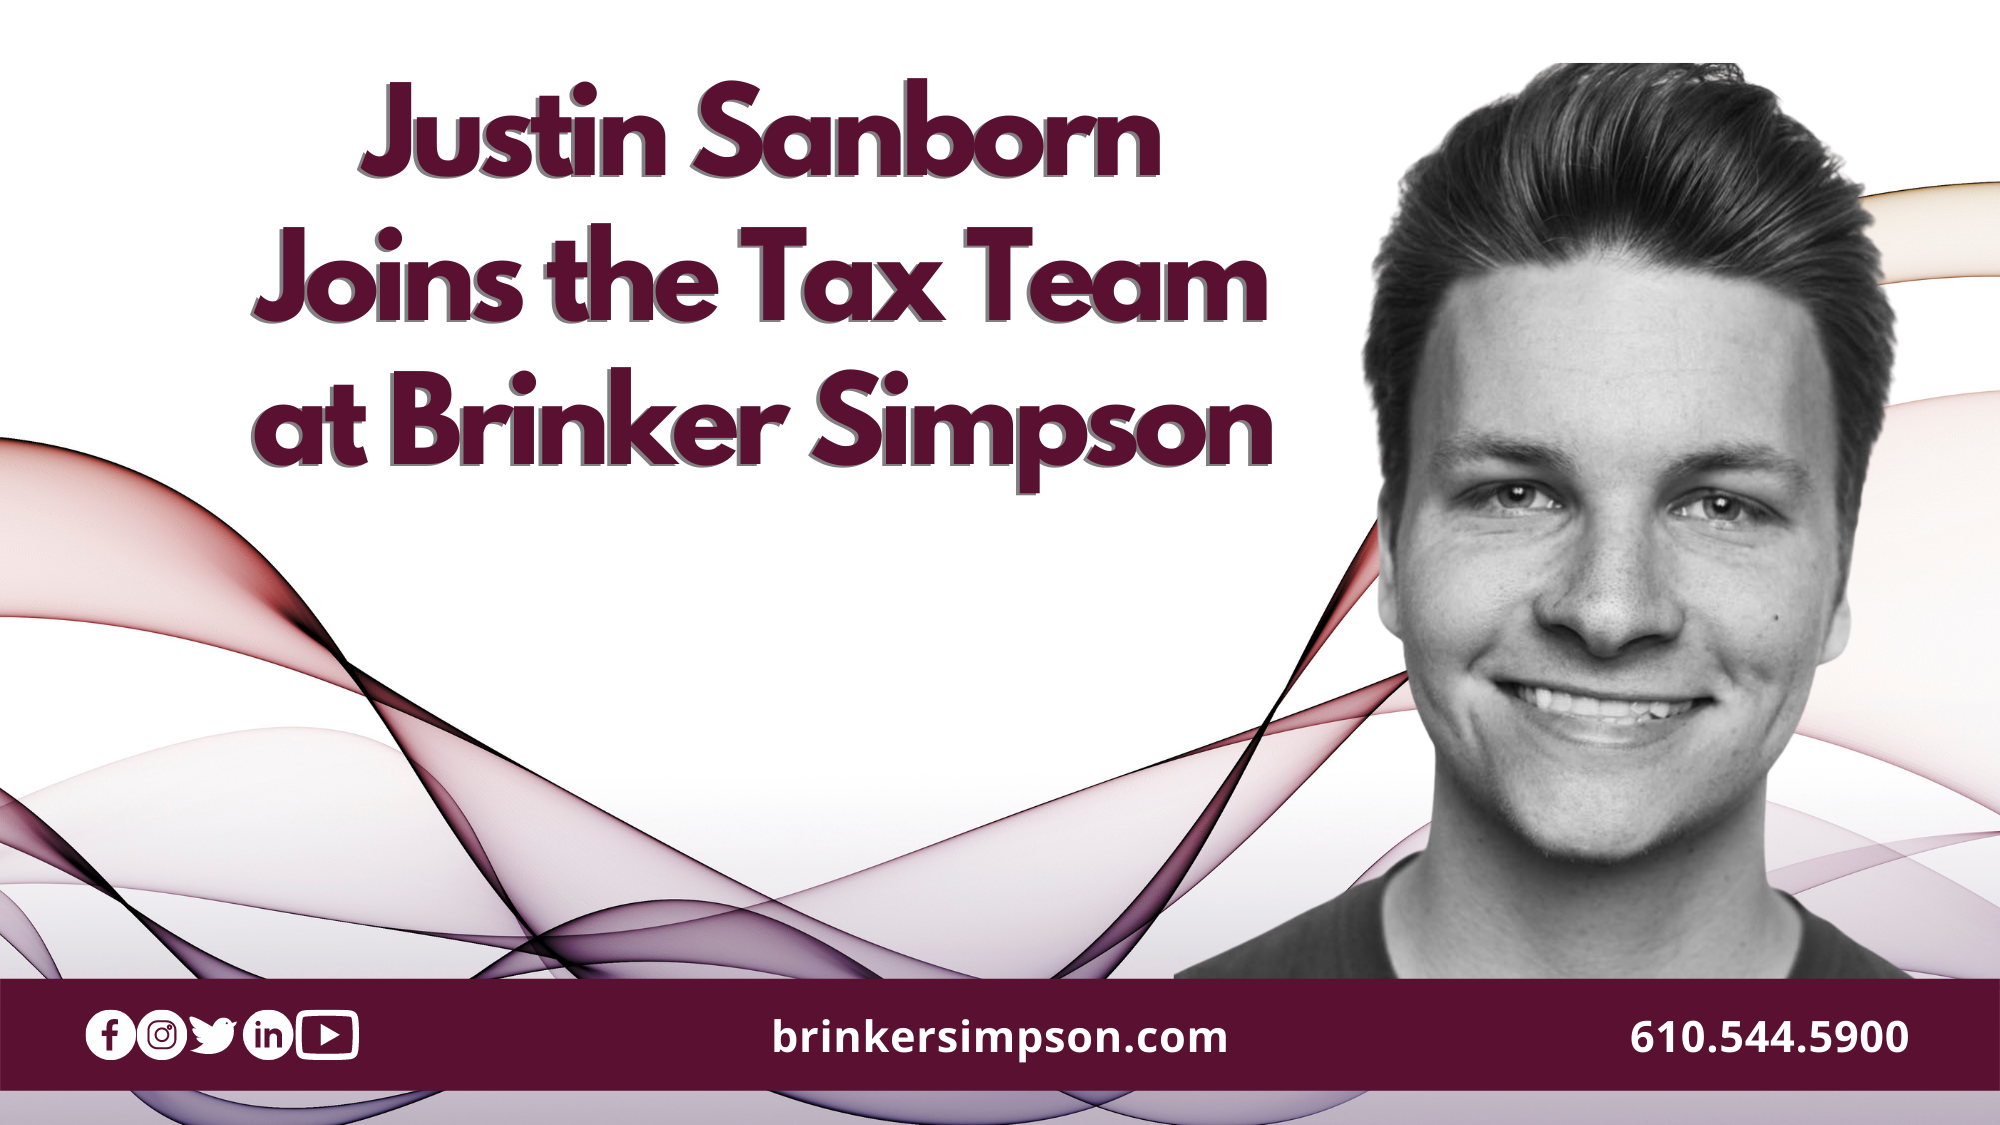 BSCO_Personnel Announcement_Justin Sanborn